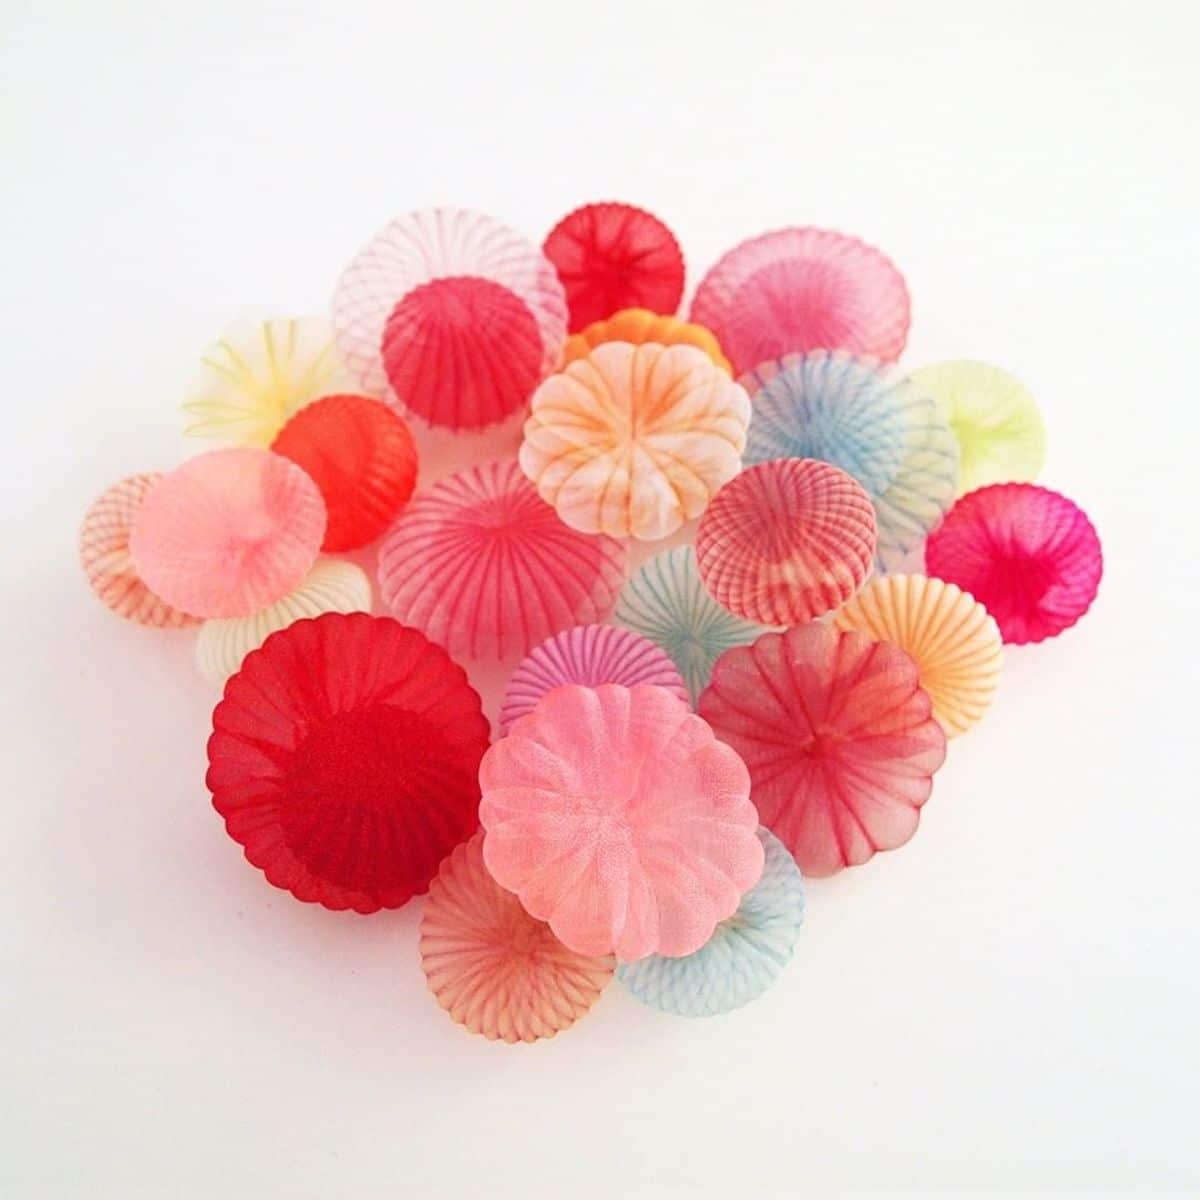 Textile Art by Mariko Kusumoto